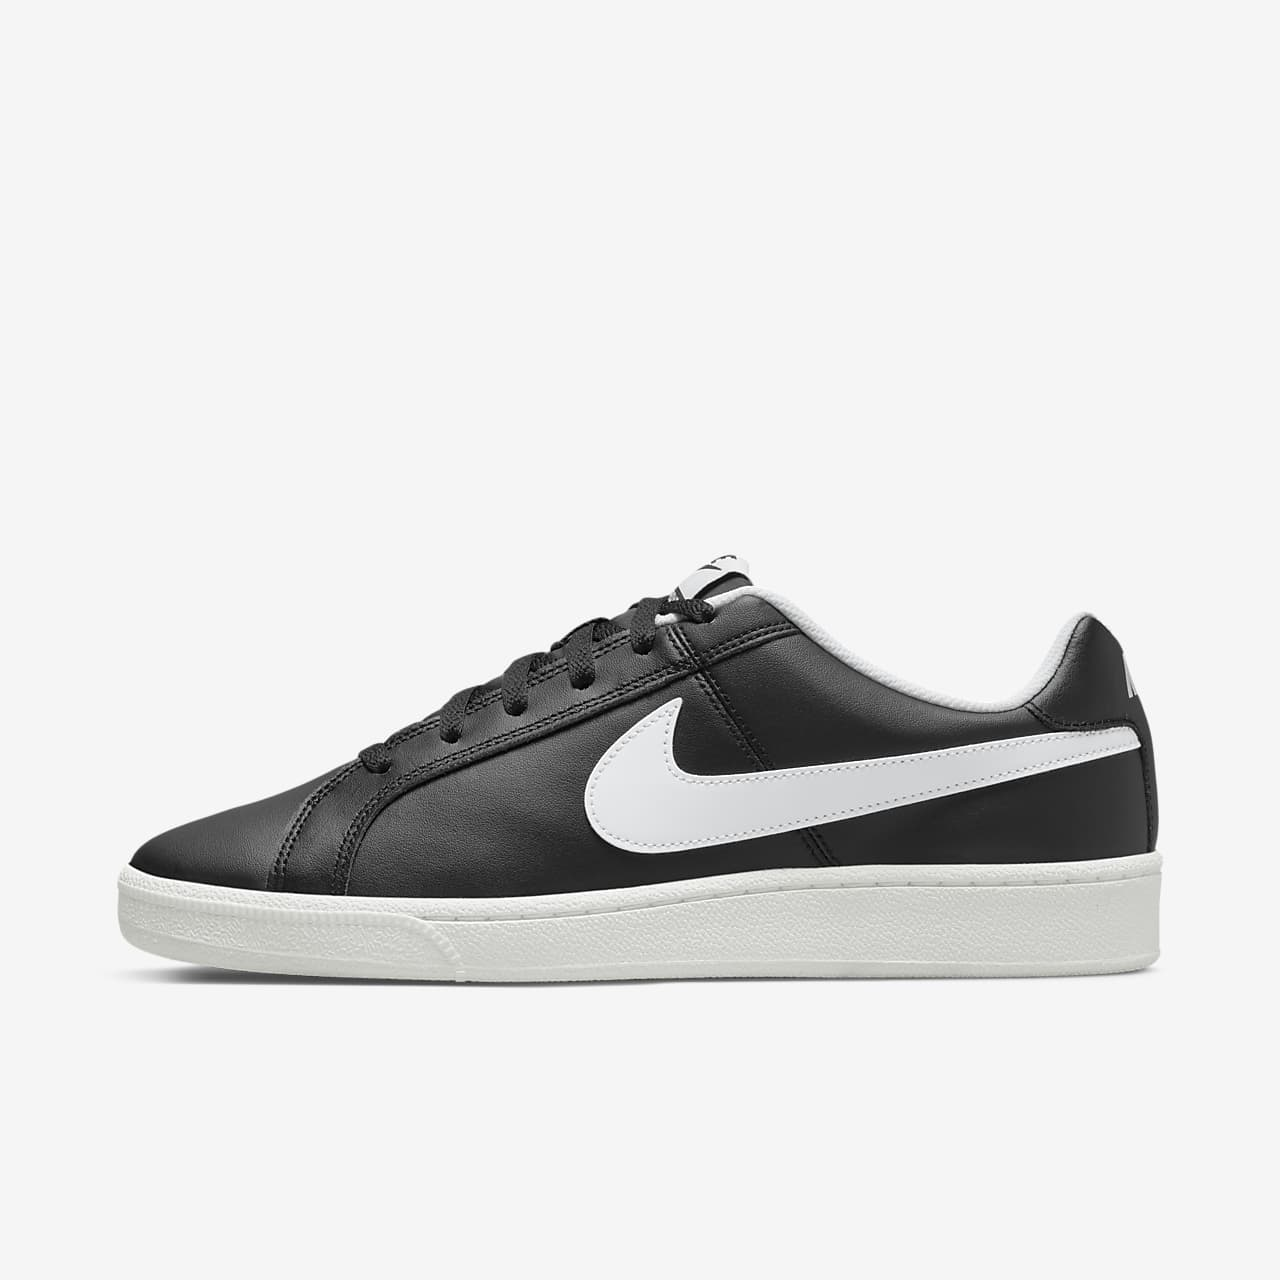 Nike Tanjun PREM Herre Sko Sort Hvit Salg Norge Nike